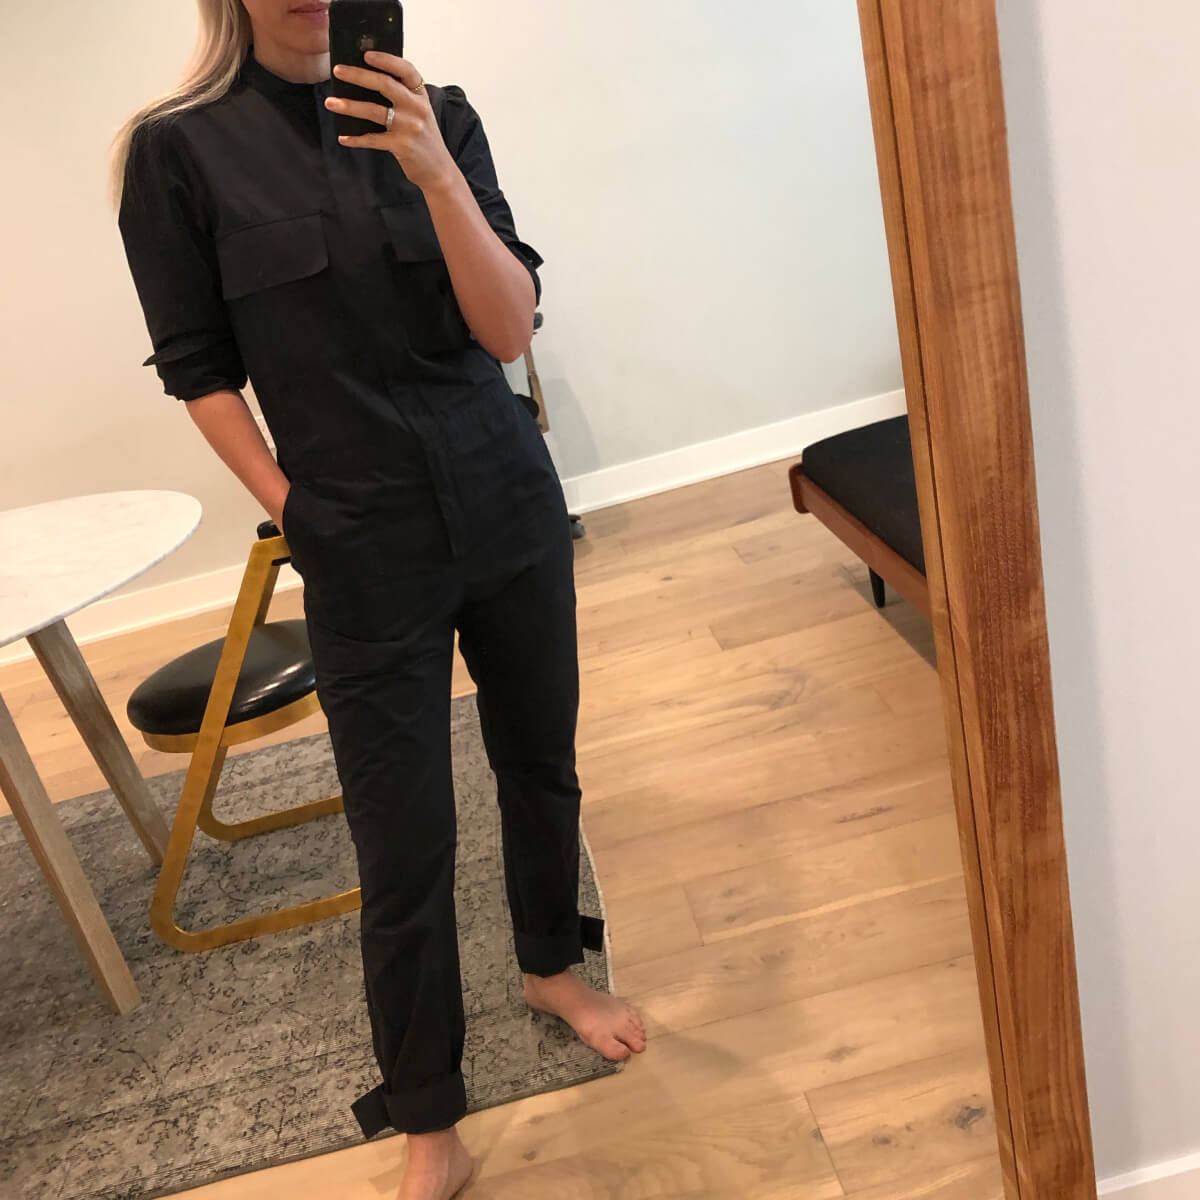 ali pew wearing a jumpsuit